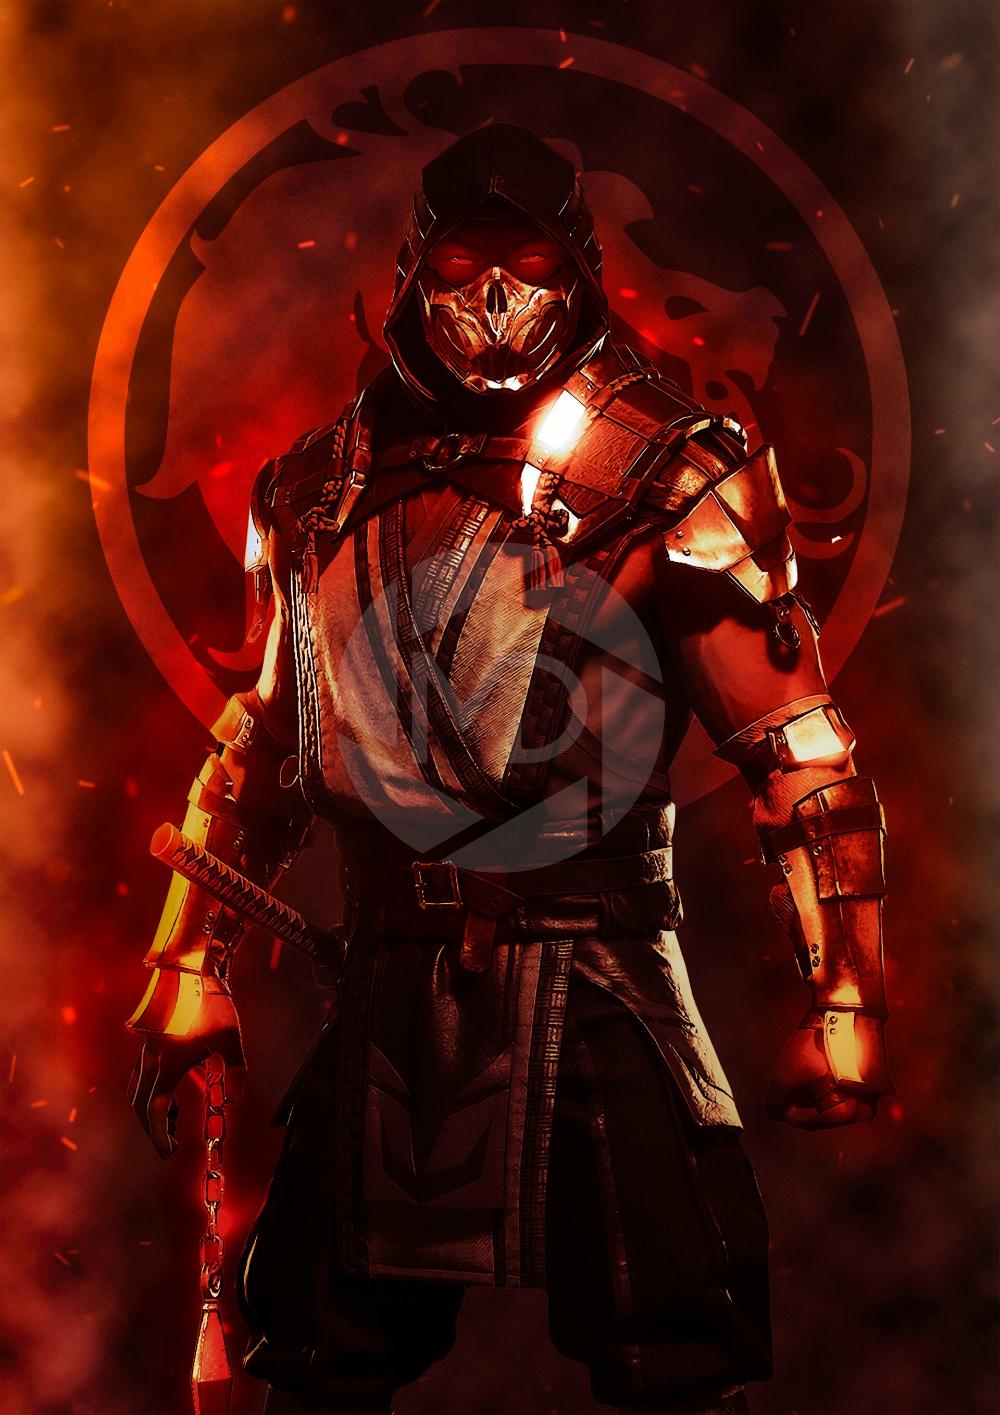 Mortal Kombat 11 Scorpion Mortal Kombat Art Raiden Mortal Kombat Scorpion Mortal Kombat